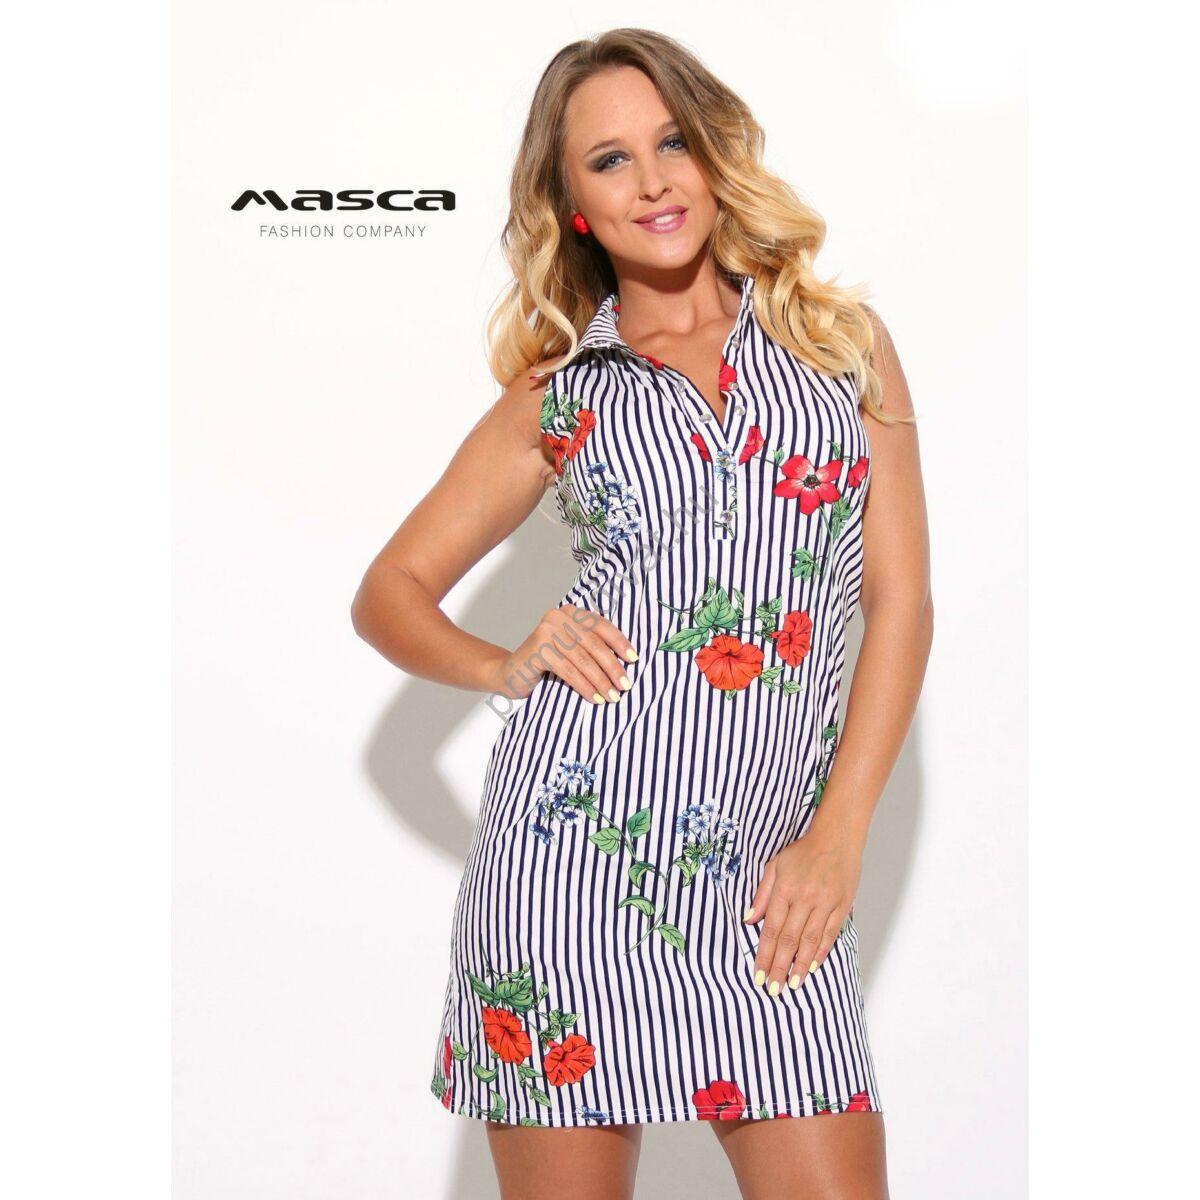 Kép 1 1 - Masca Fashion galléros 4f38b8791c